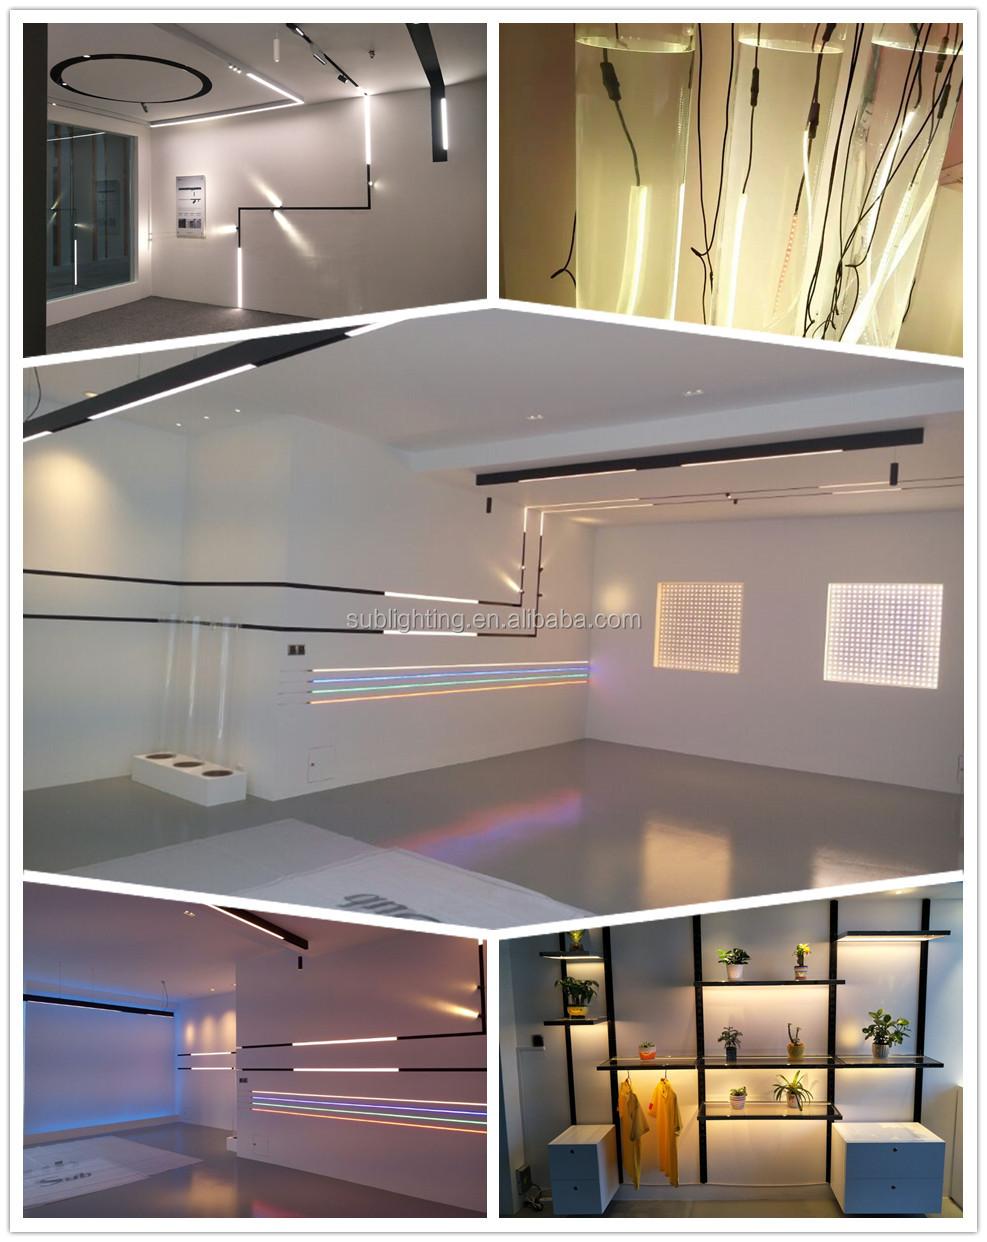 Intertek lighting fixturelight fixture housingtrack linear light intertek lighting fixturelight fixture housingtrack linear light led 36w arubaitofo Choice Image